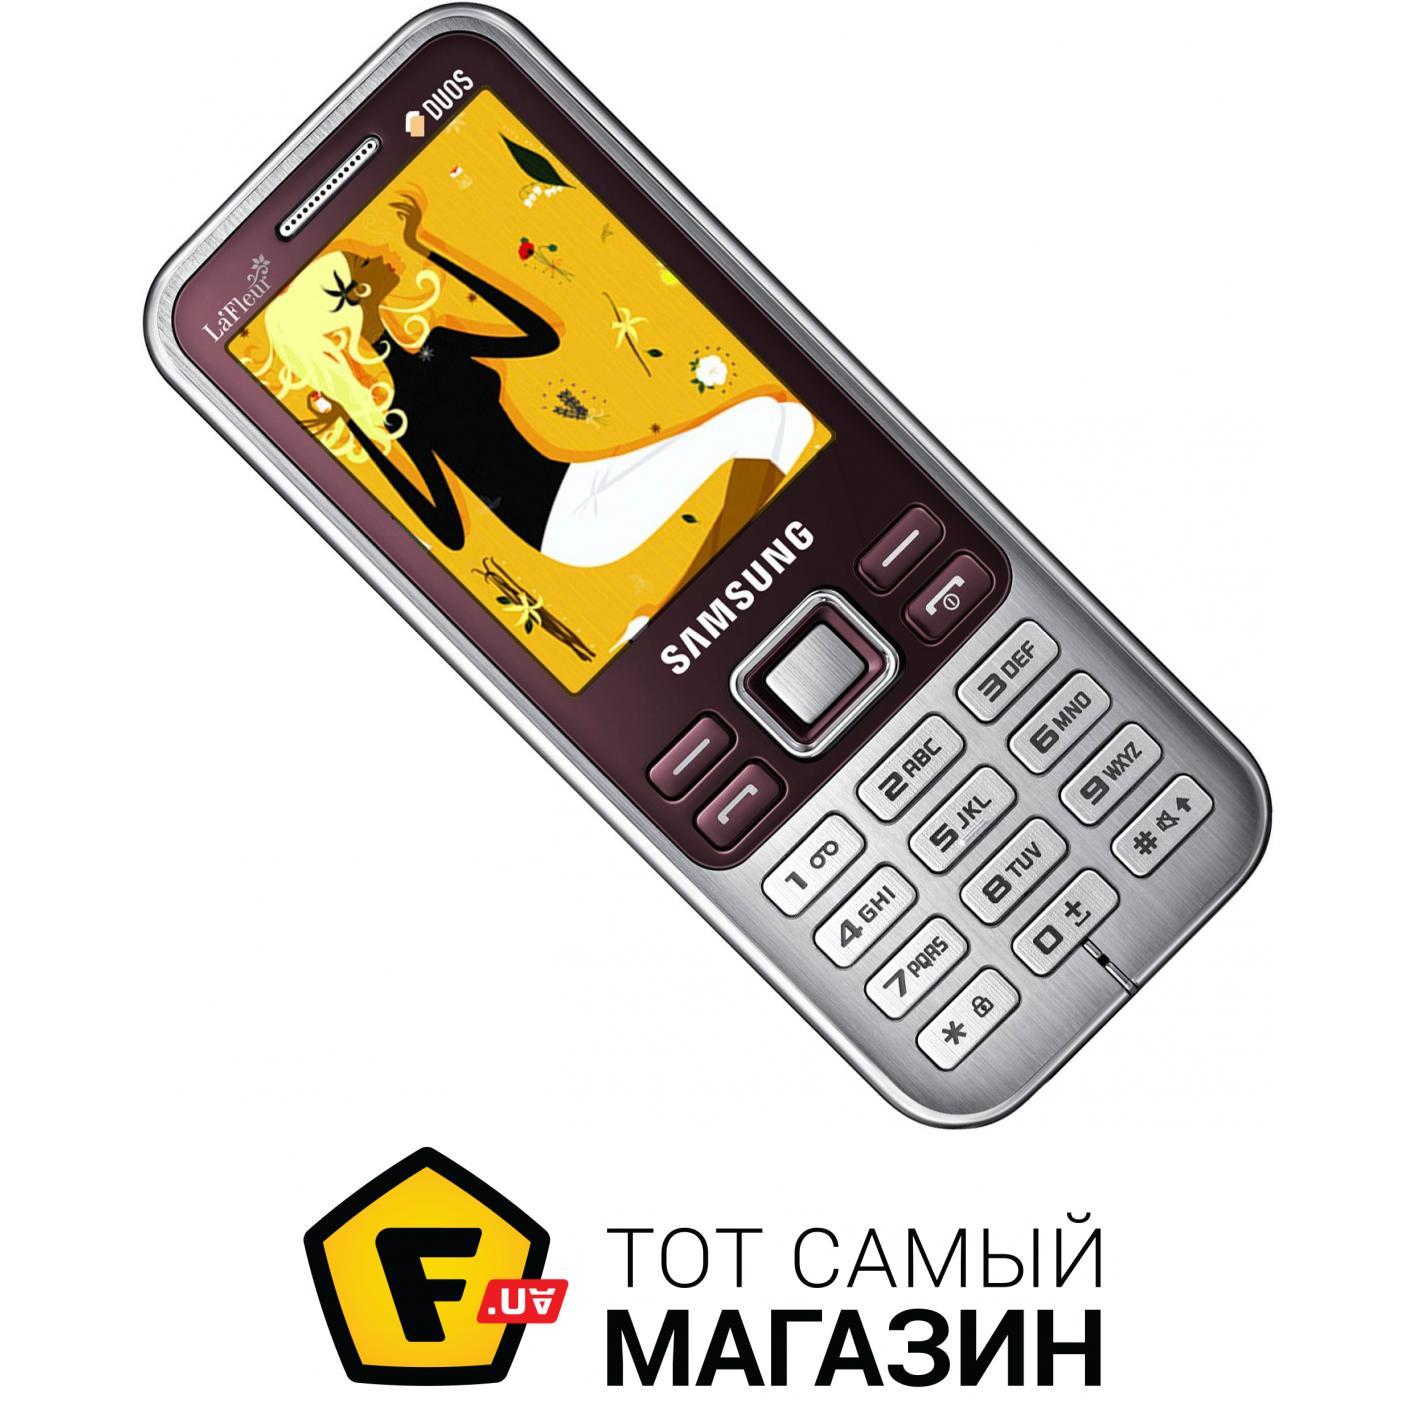 c3322i русская прошивка